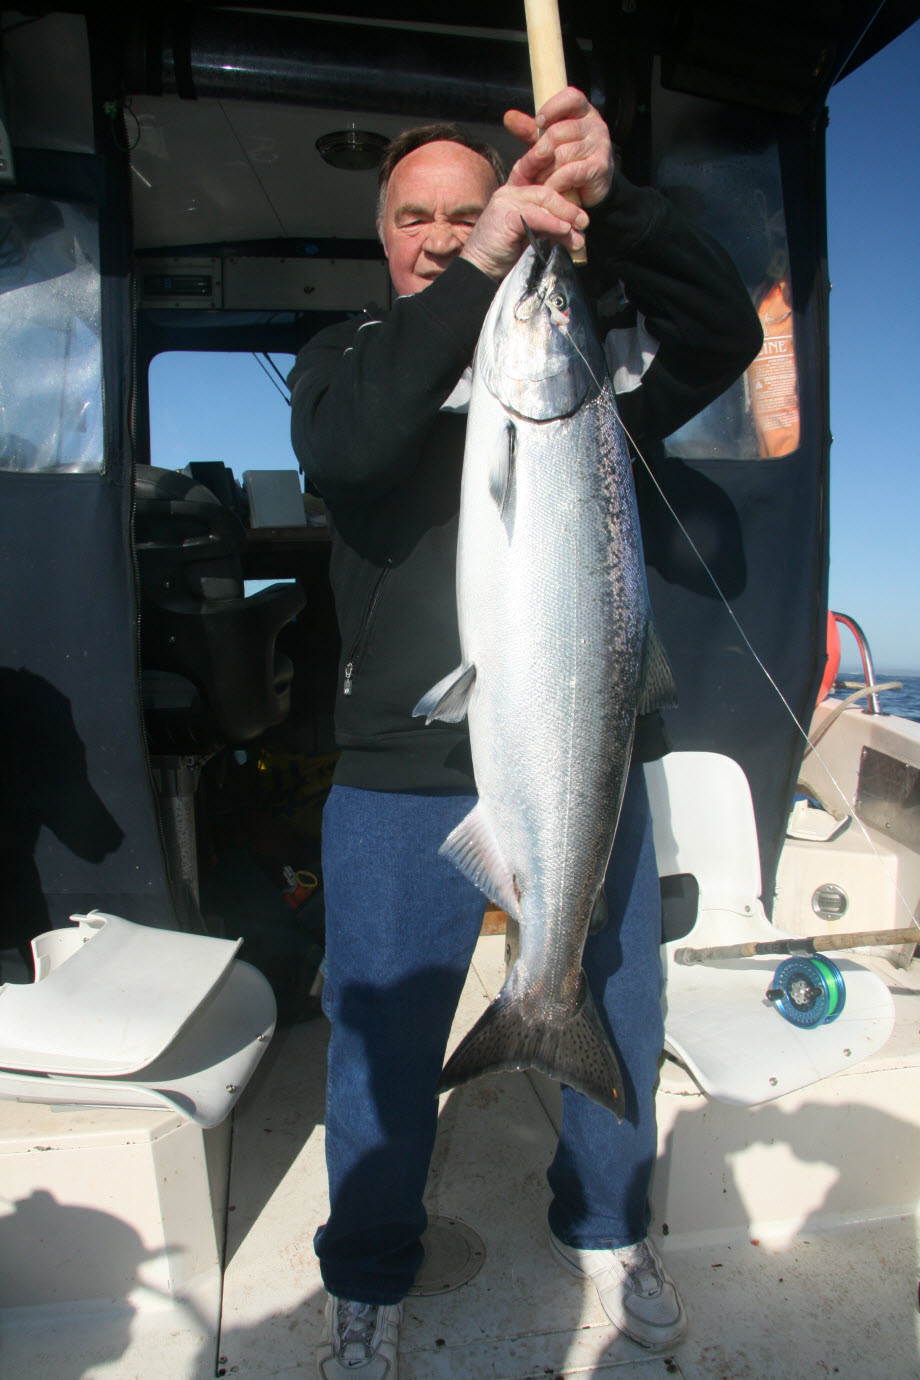 WestCoastFish0199